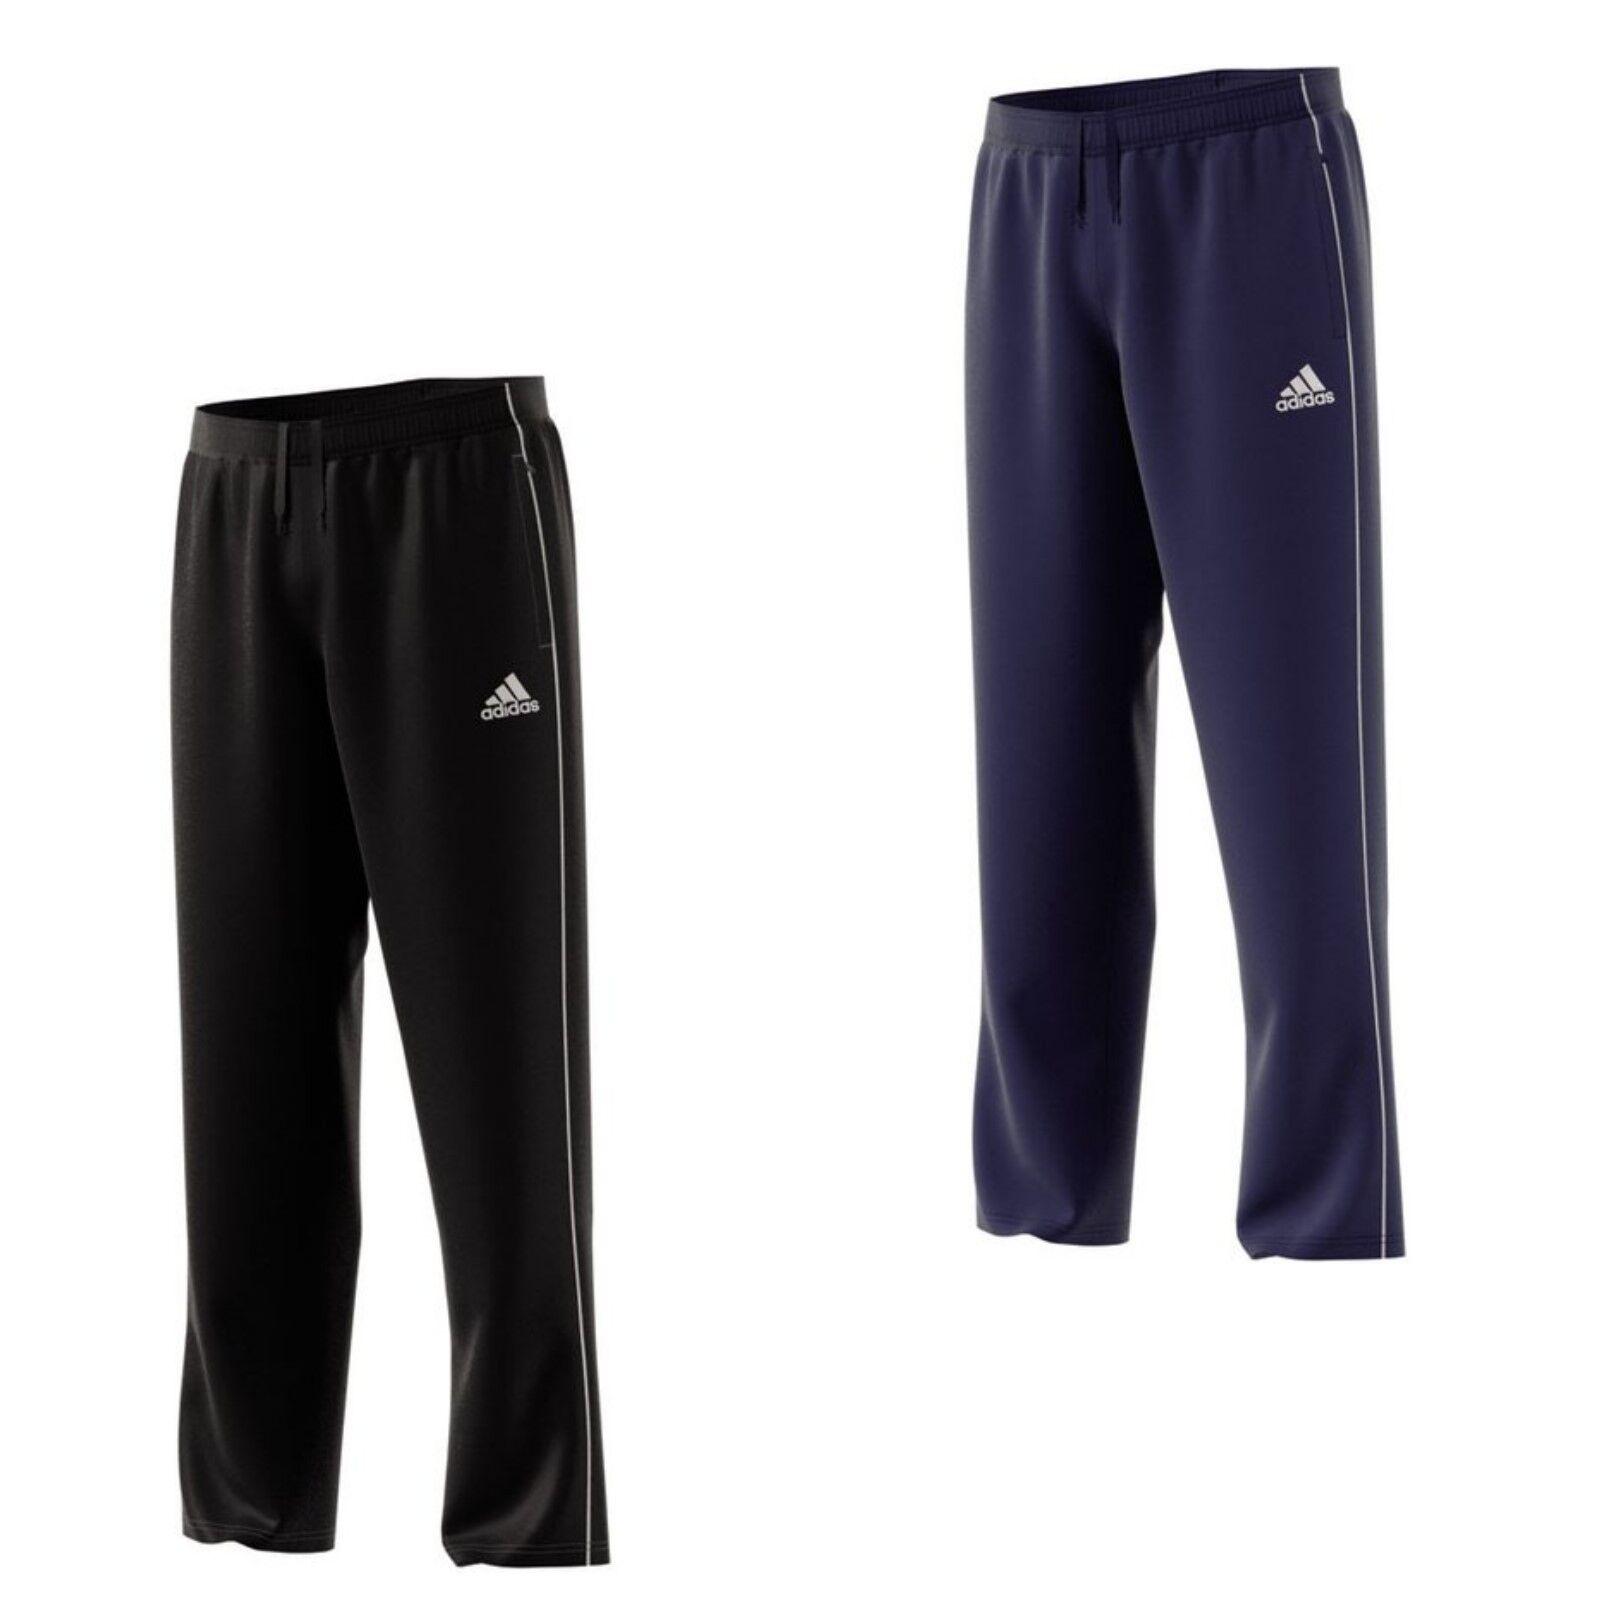 df38b4358ea47e adidas Jogginghose Herren Sporthose Trainingshose RV Taschen schwarz blau  lang